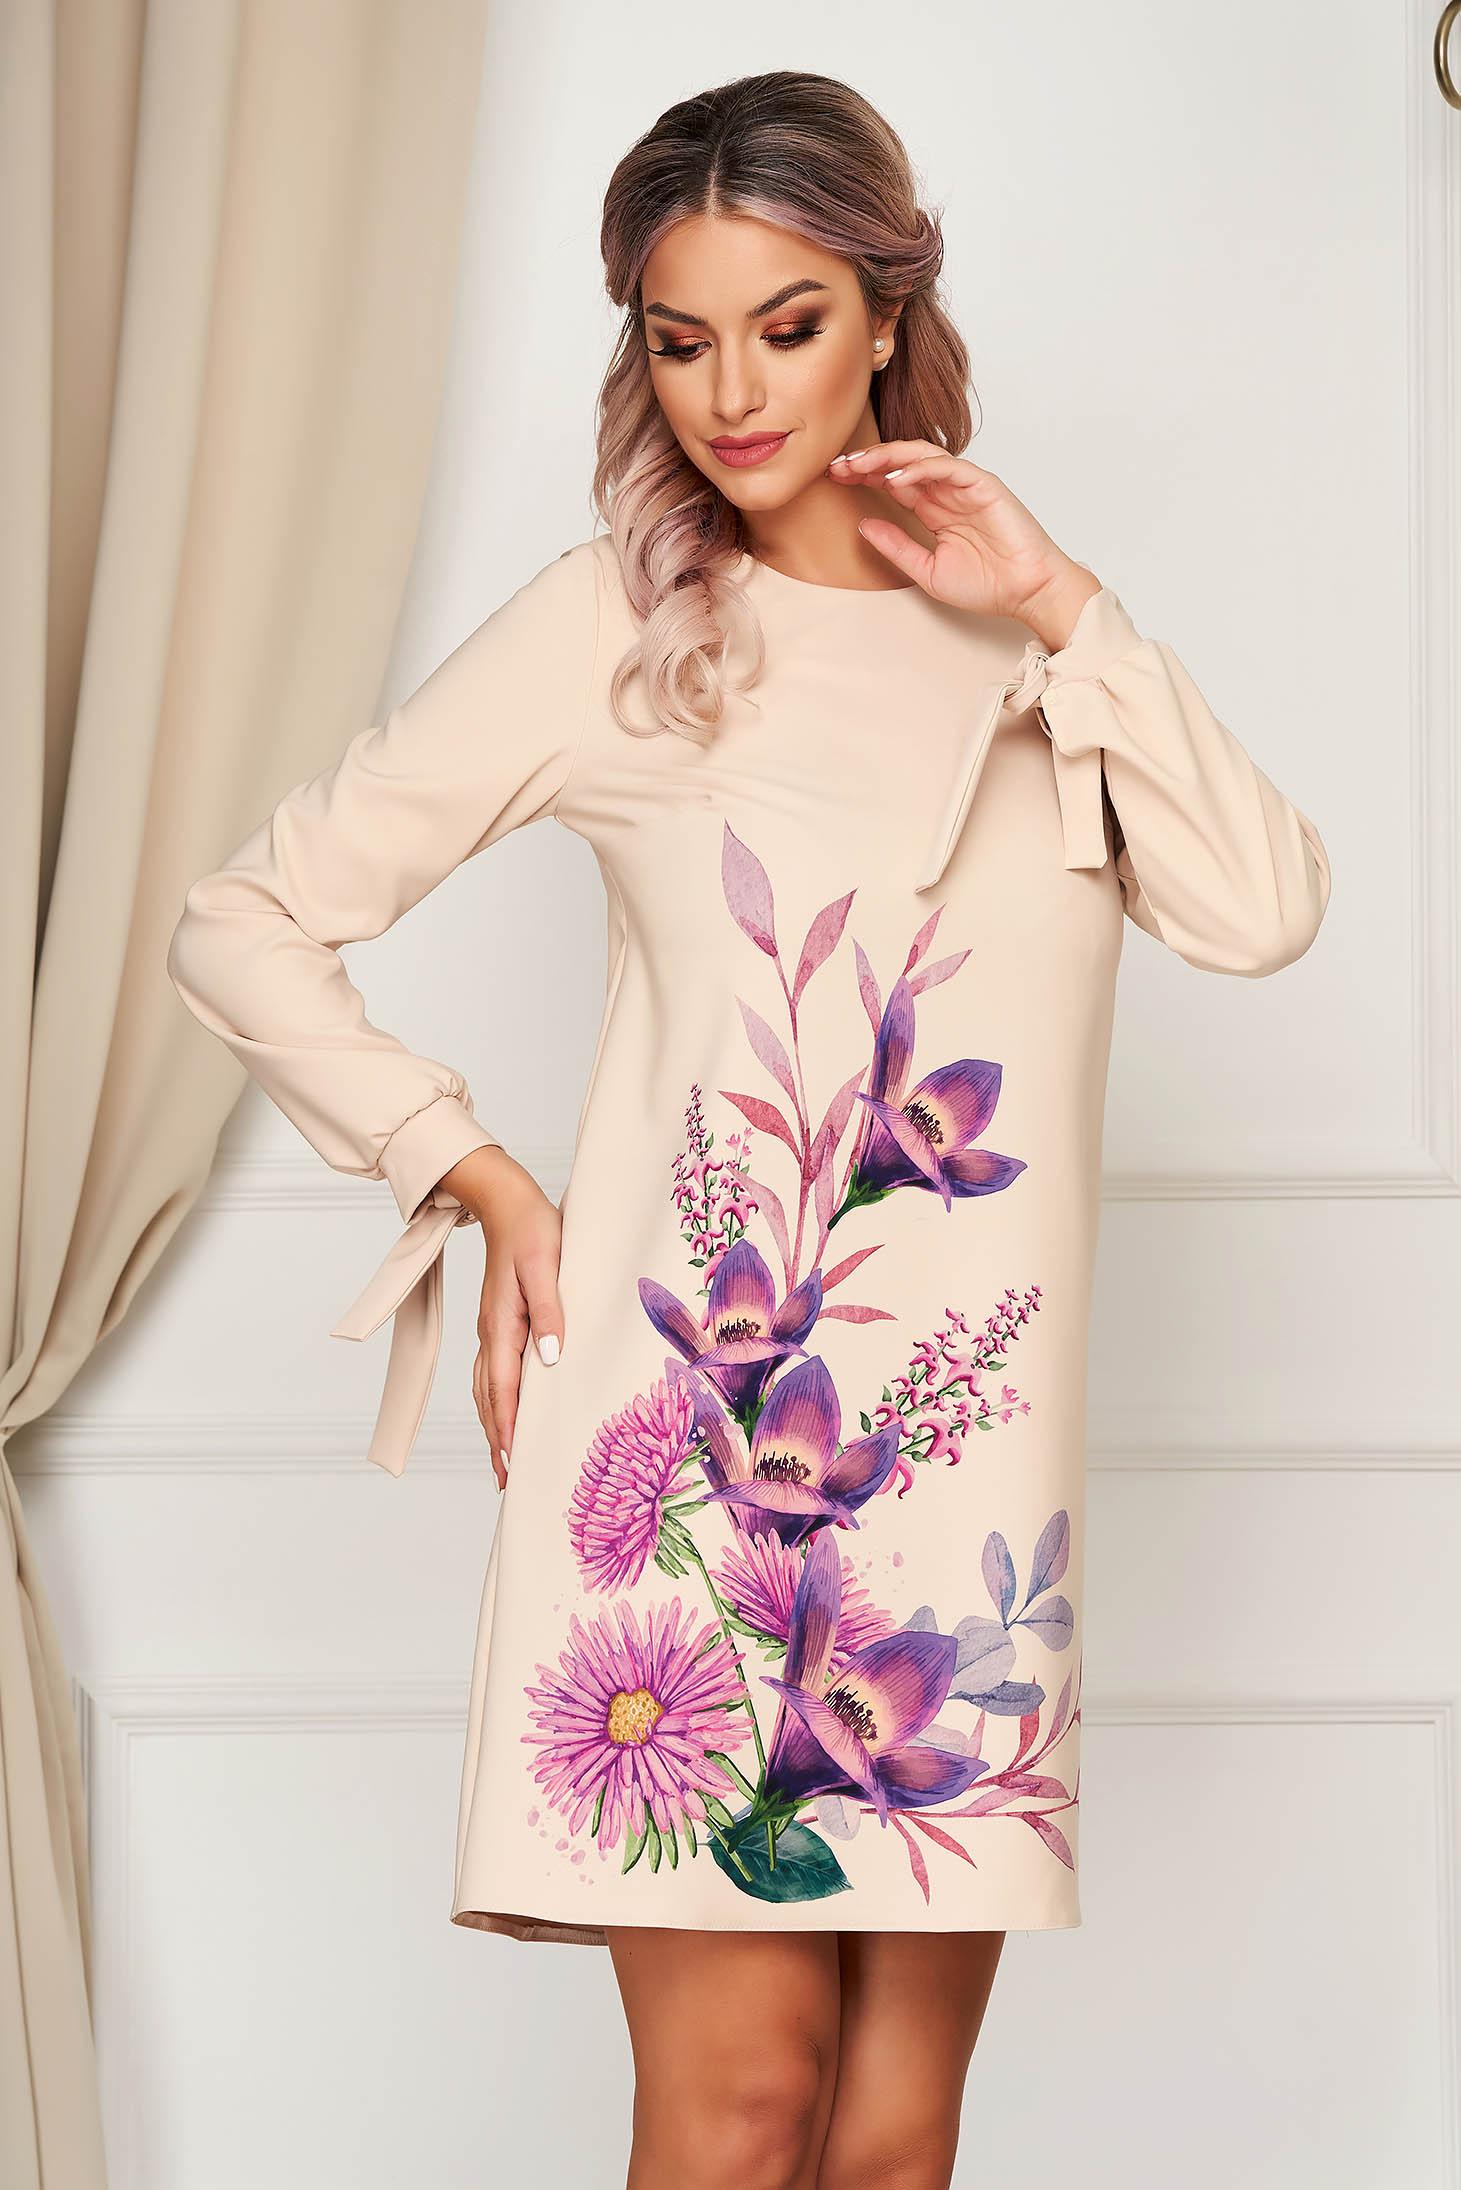 Elegant short cut cream dress StarShinerS a-line cloth with floral print